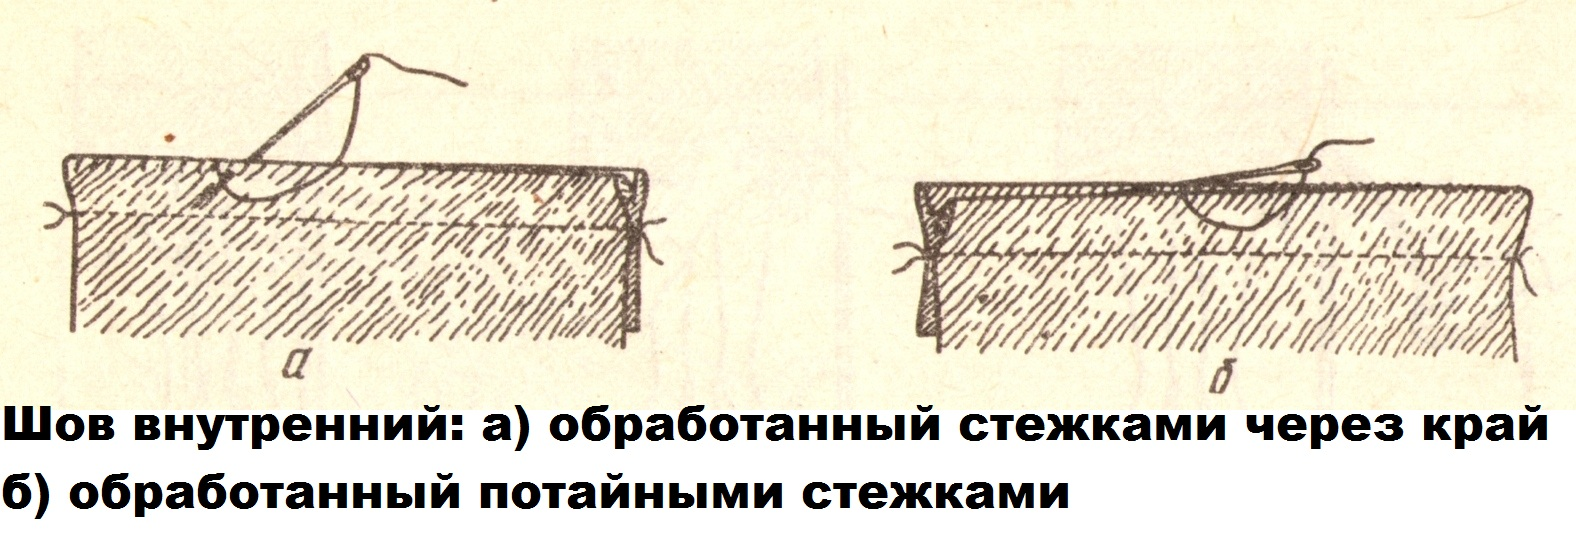 Шов внутренний (5)